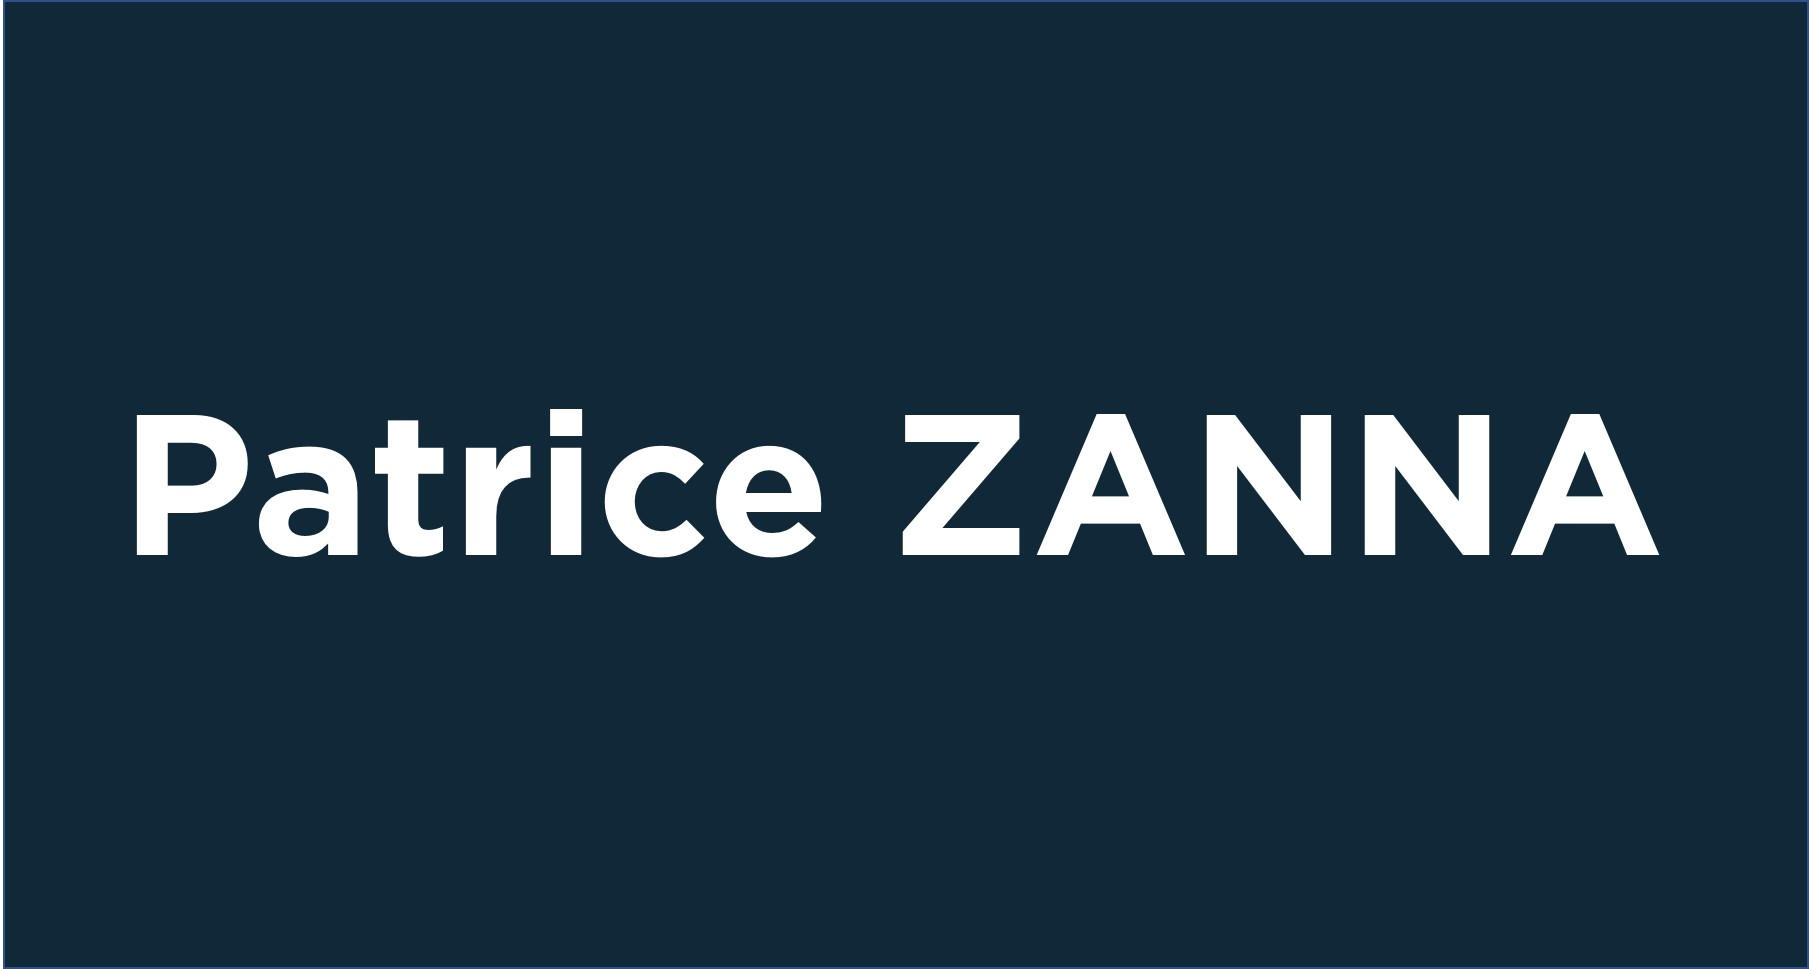 Patrice Zanna